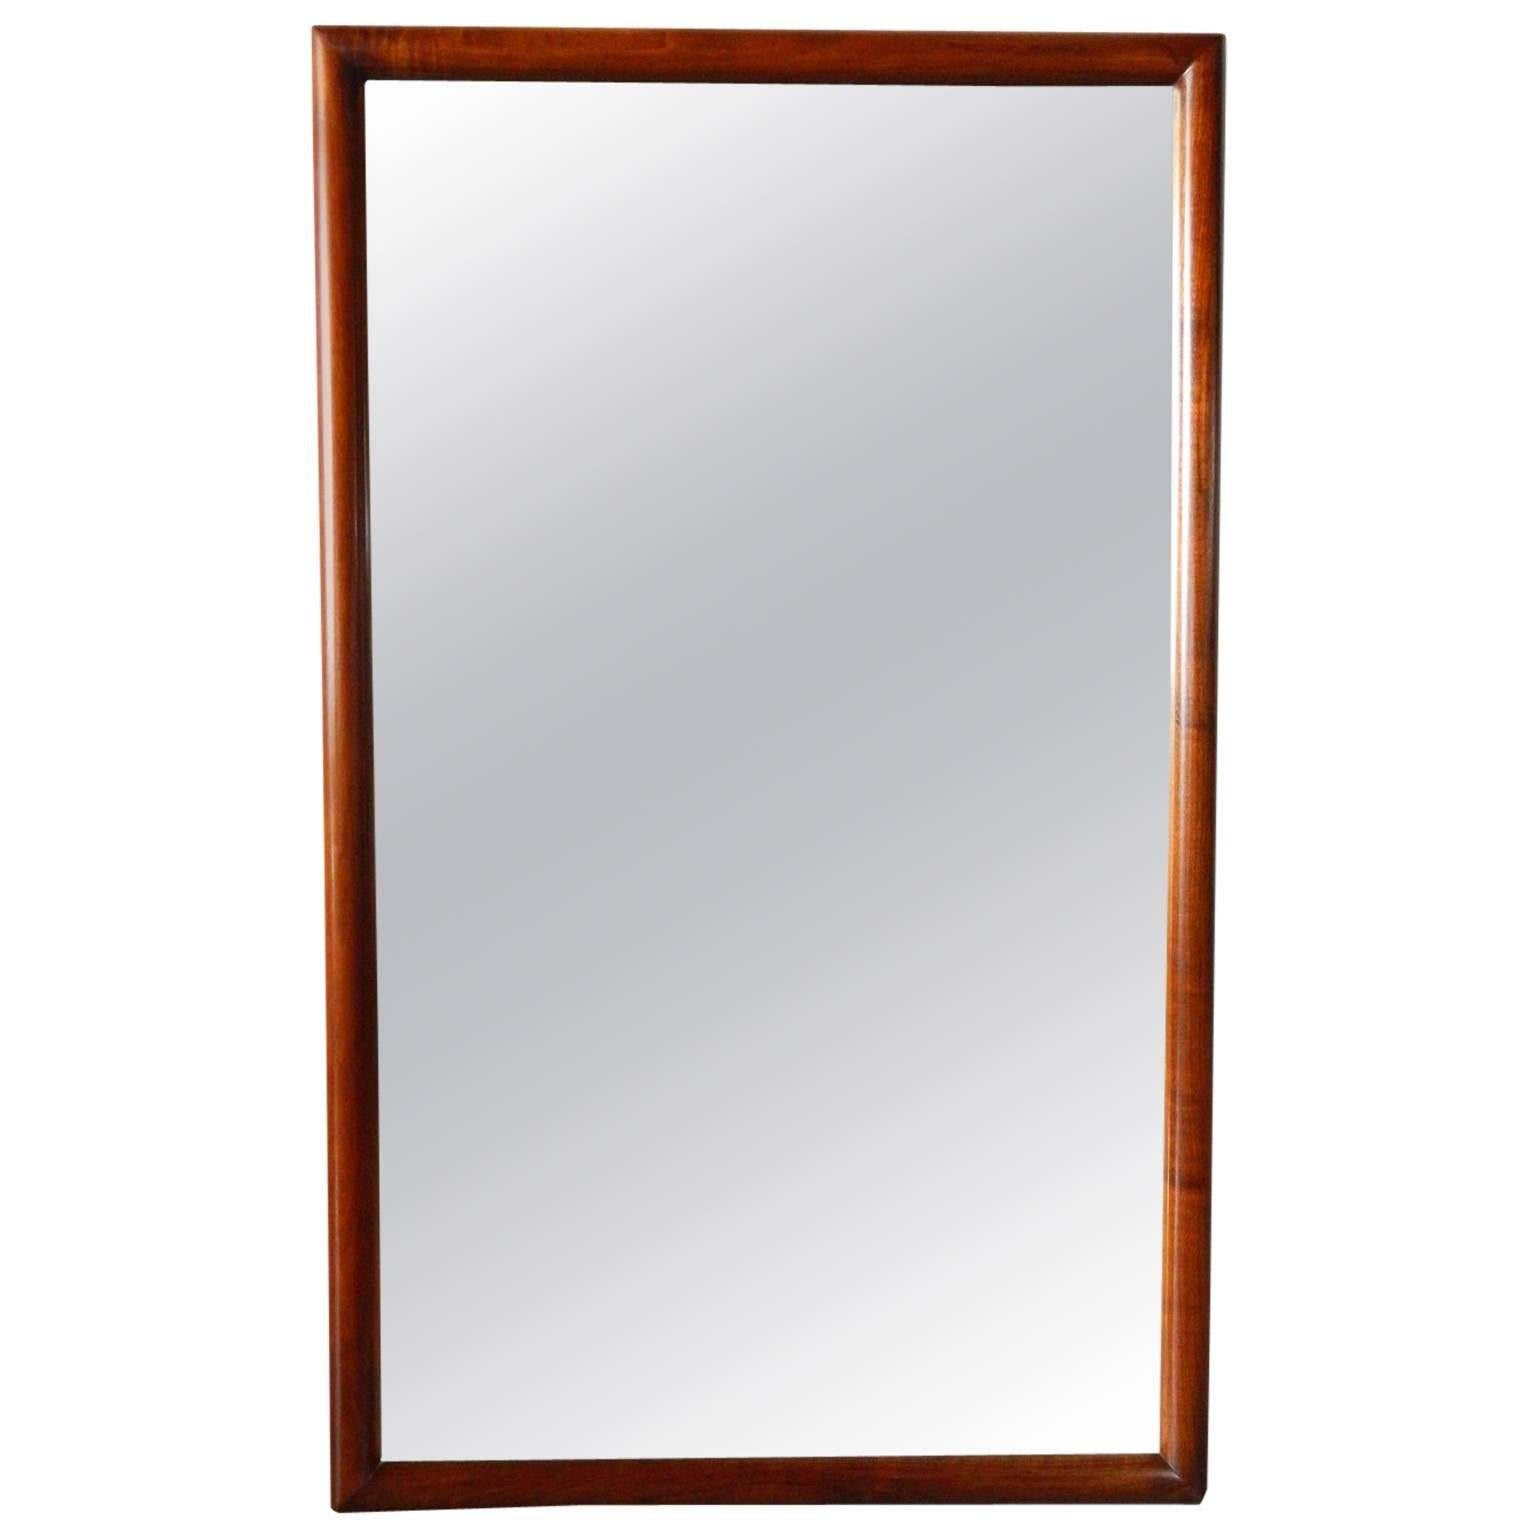 Mid Century Modern Walnut Mirror By Widdicomb Furniture Co. 1